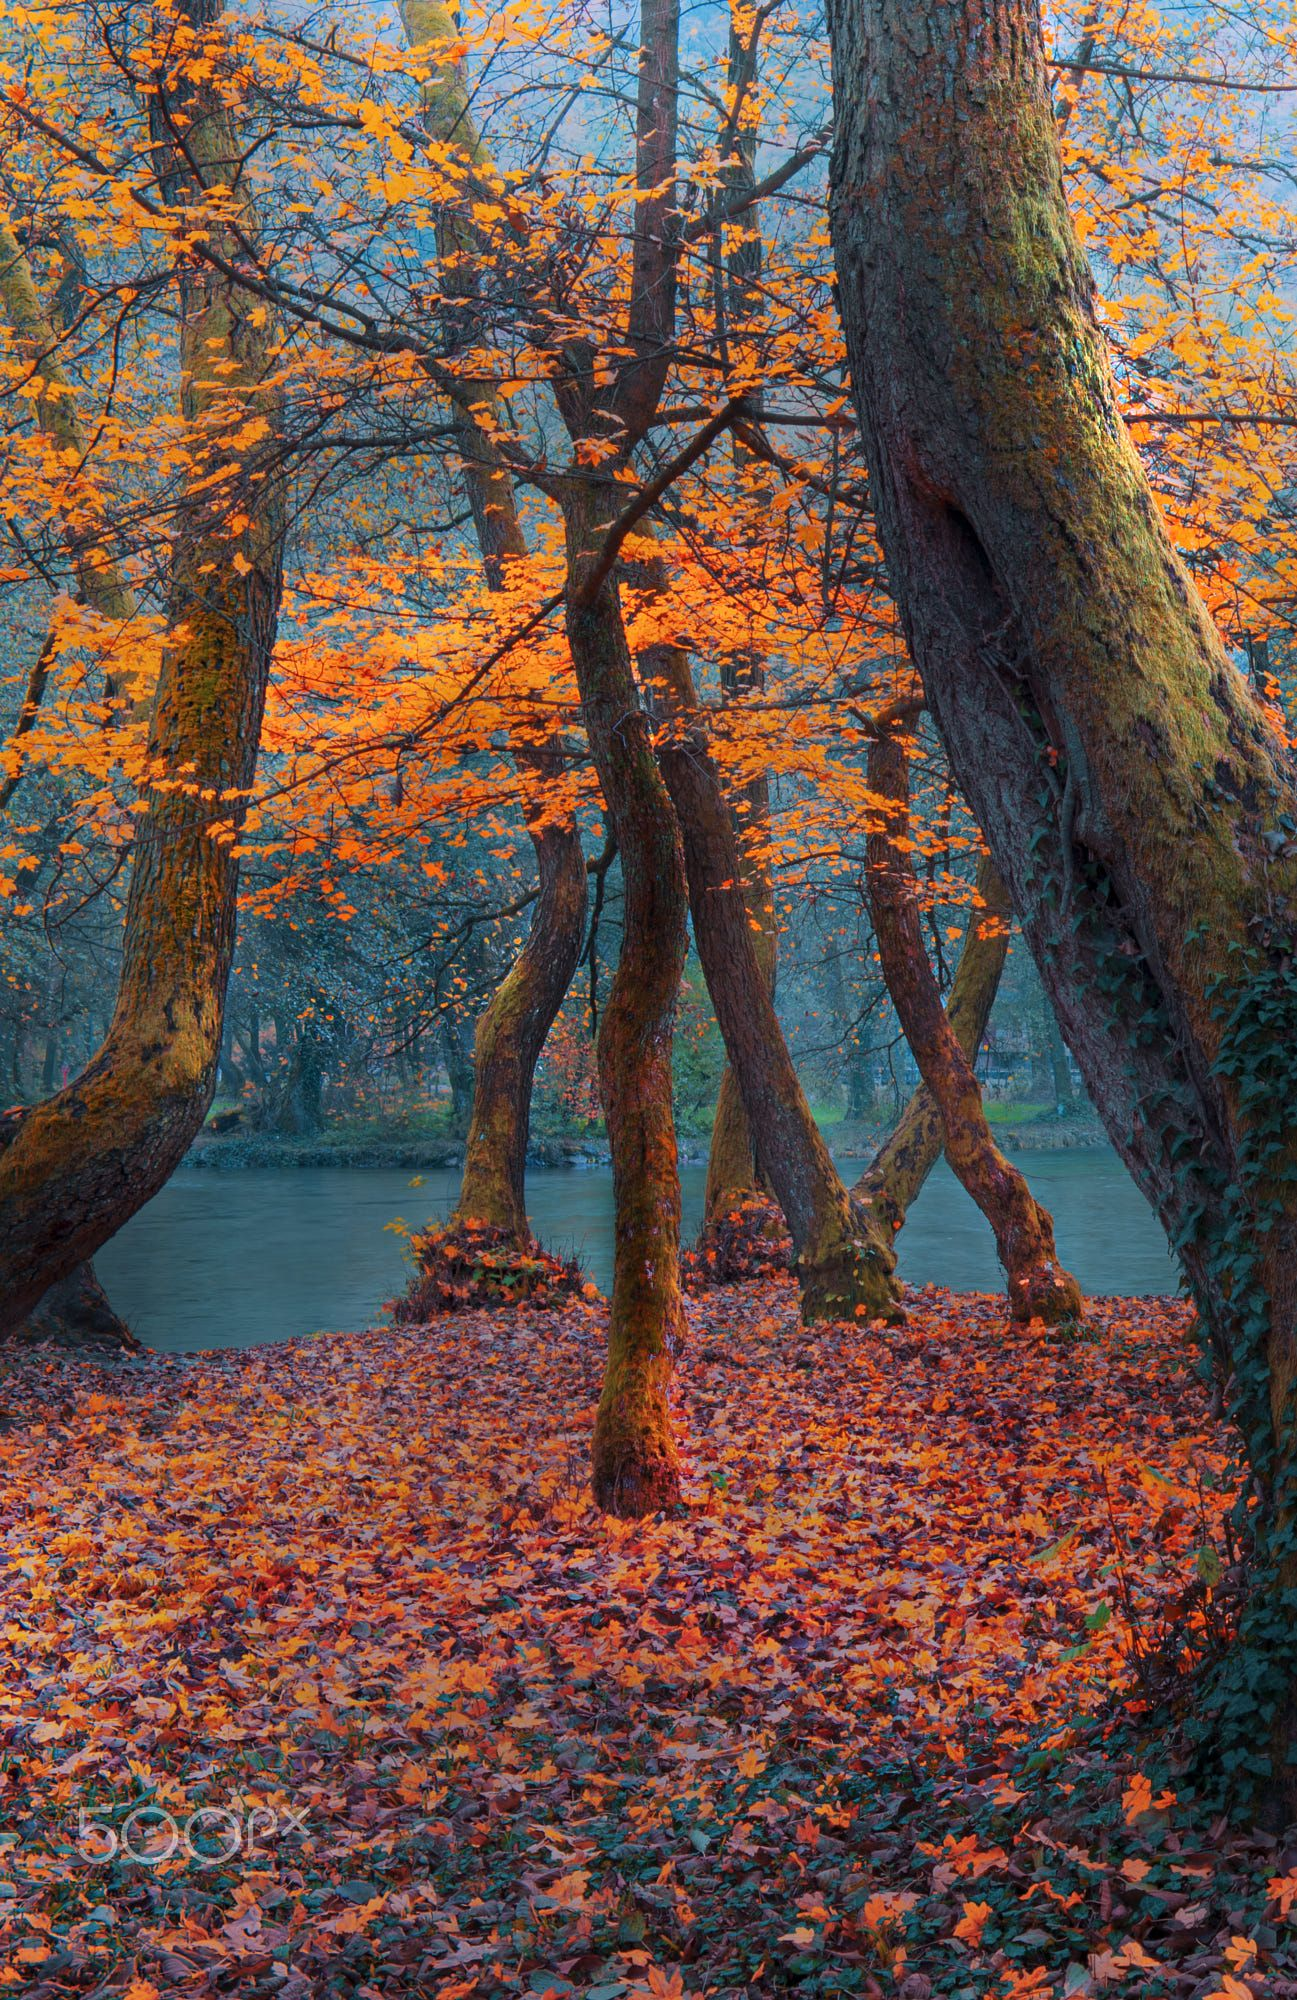 Autumn Impression Ilidza Sarajevo Bosnia Autumn Landscape Nature Photography Autumn Aesthetic